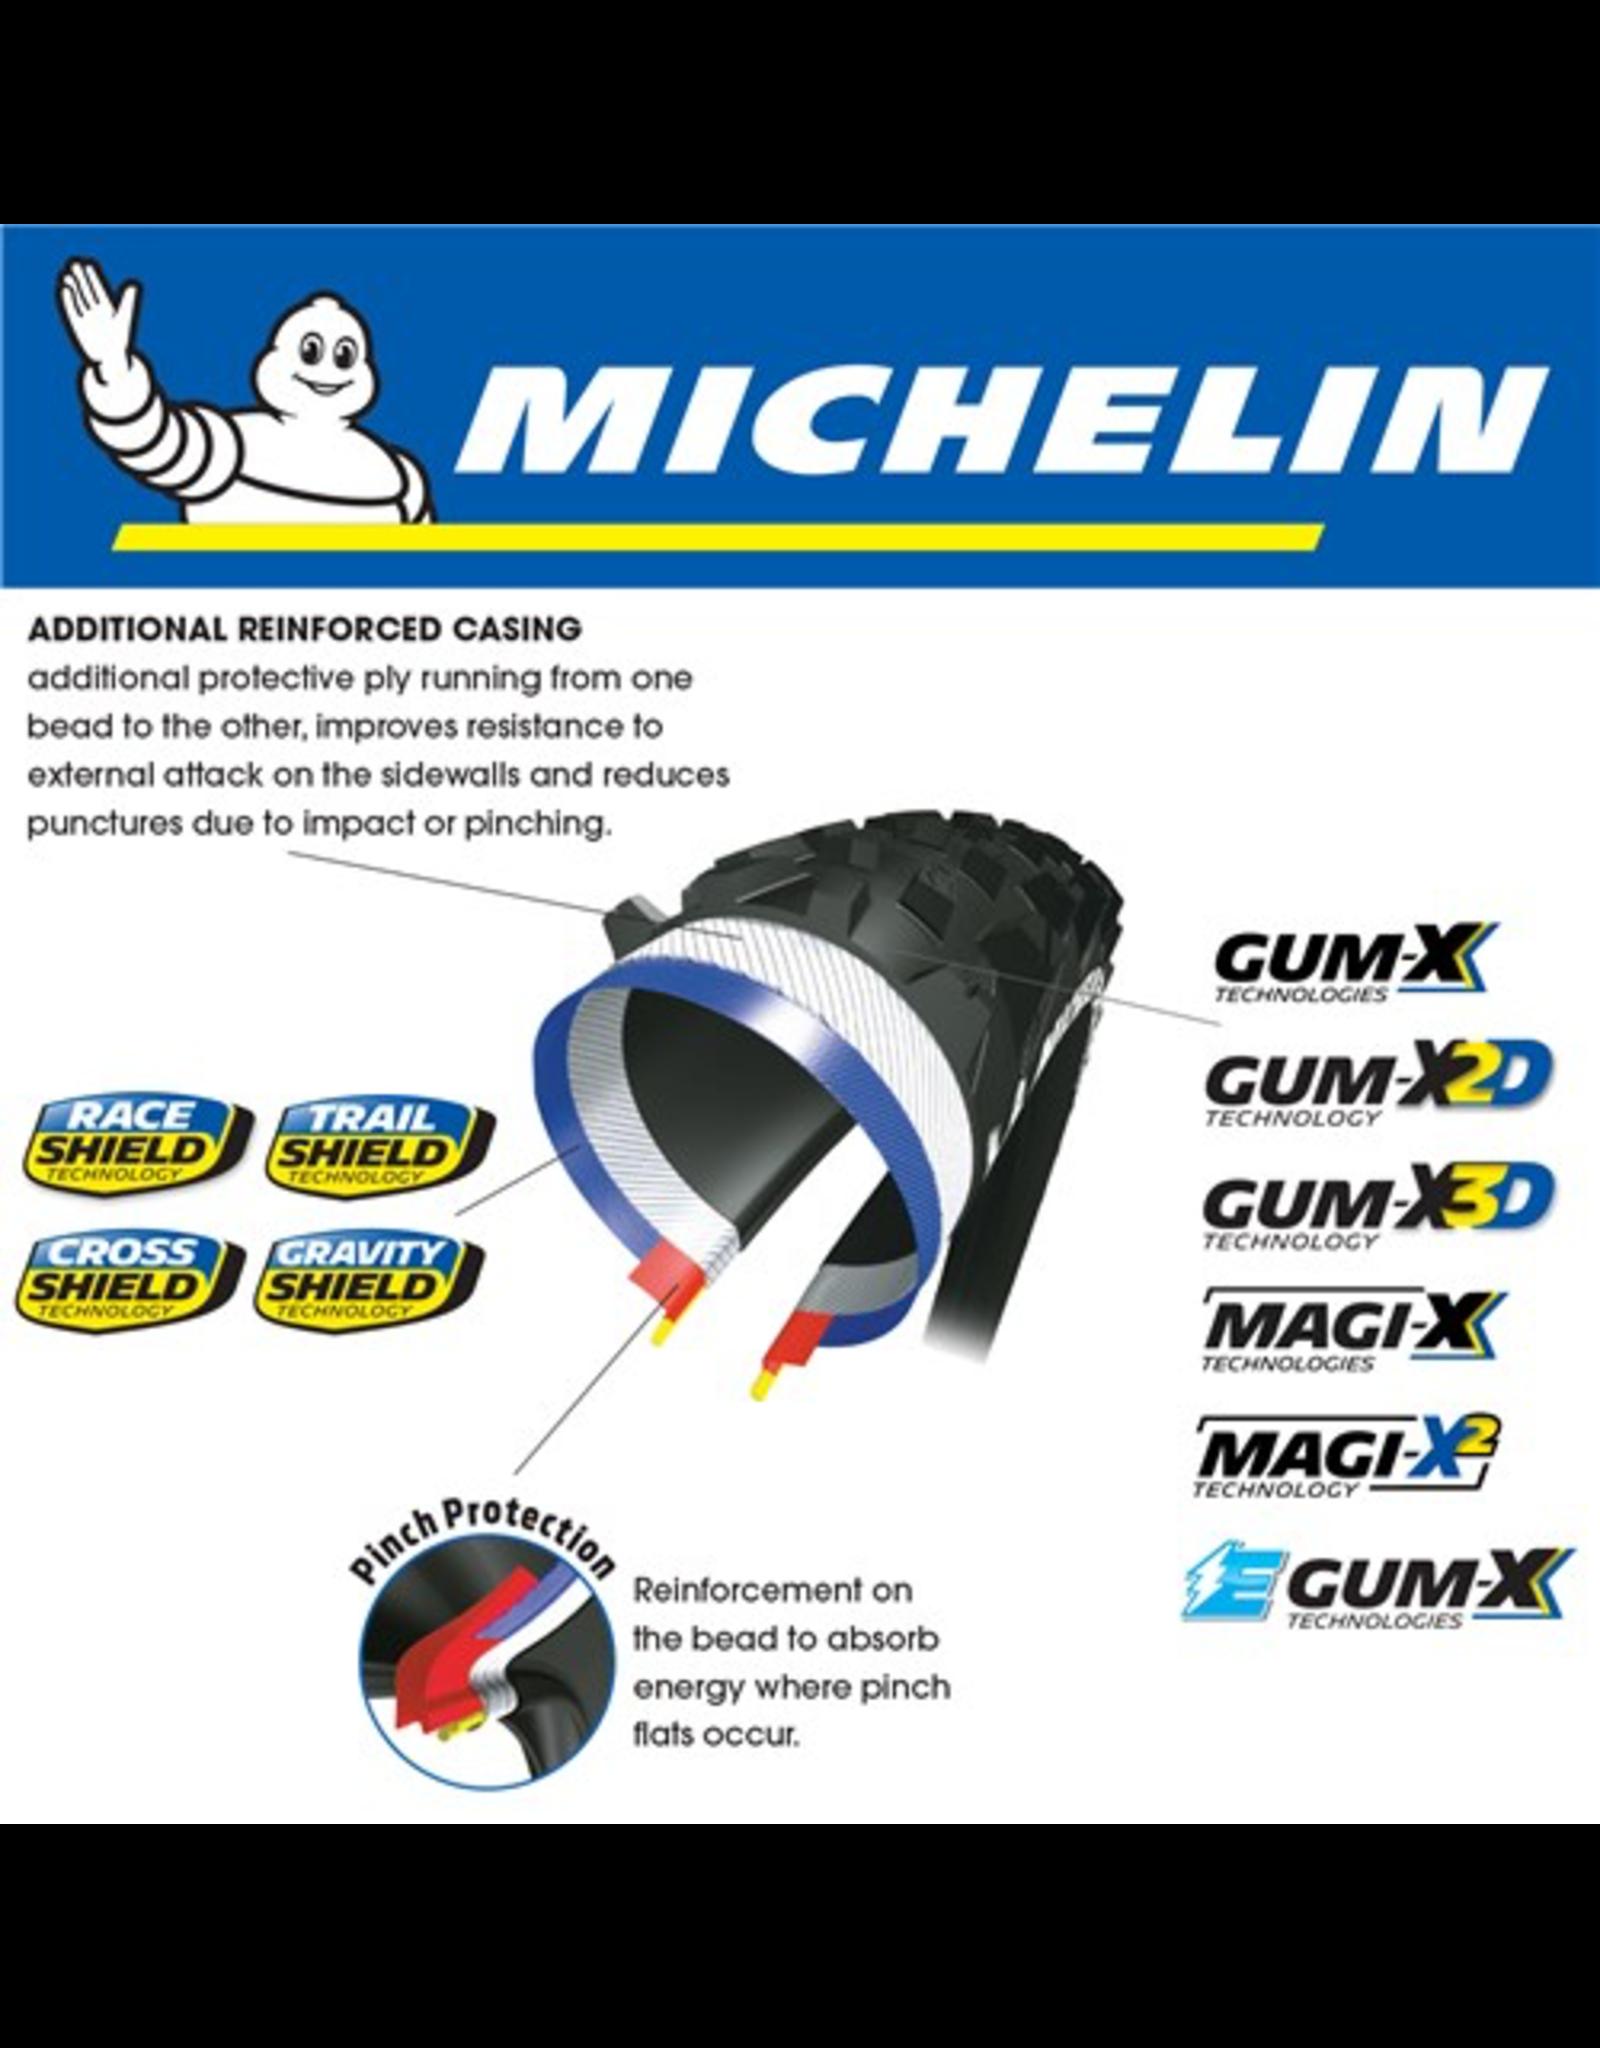 "MICHELIN TYRE MICHELIN WILD ENDURO R COMPETITION GUM-X3D 27.5x2.4"" FOLD"